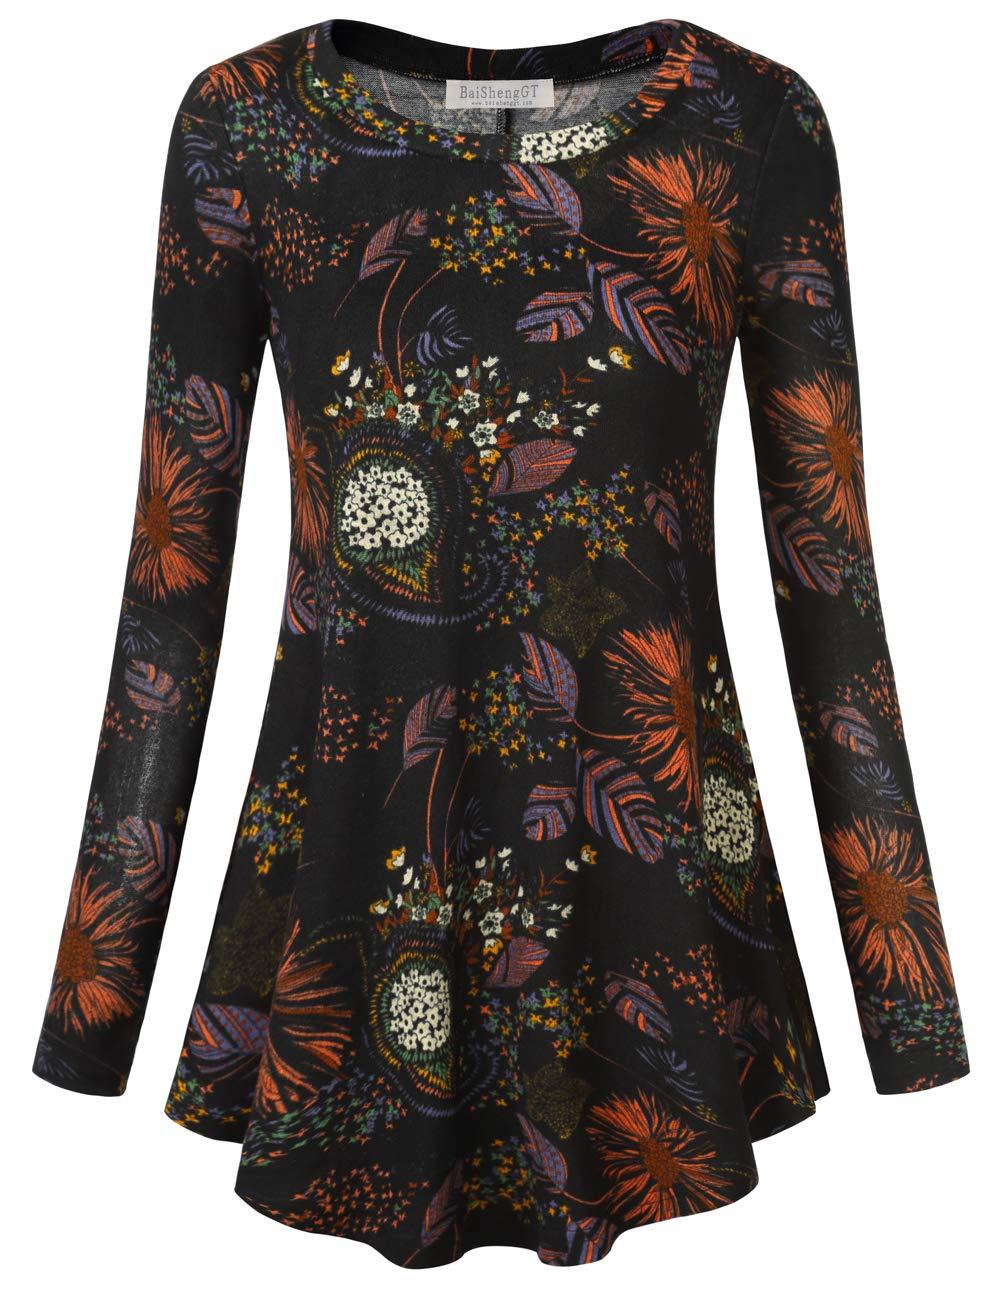 Ladies Blouses, BAISHENGGT Women's Printed Casual Knit Shirts Long Sleeve Tunic Tops Blouse Black Floral 3 Medium